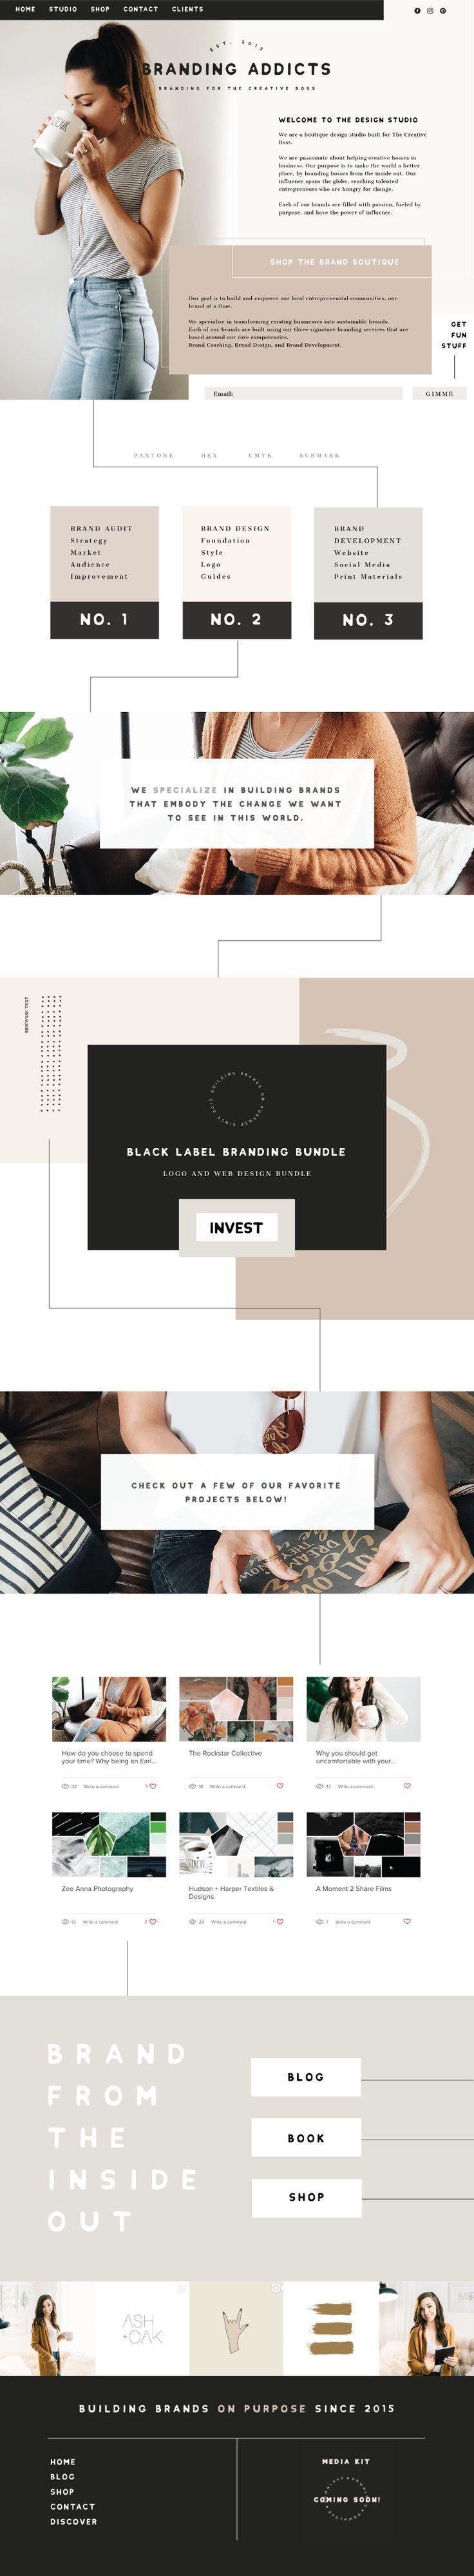 Warm Cozy Trendy Subtle Stylish Web Design Created For Branding Addicts Brand Designer Website Wix Tau Web Design Logo Web Layout Design Branding Design